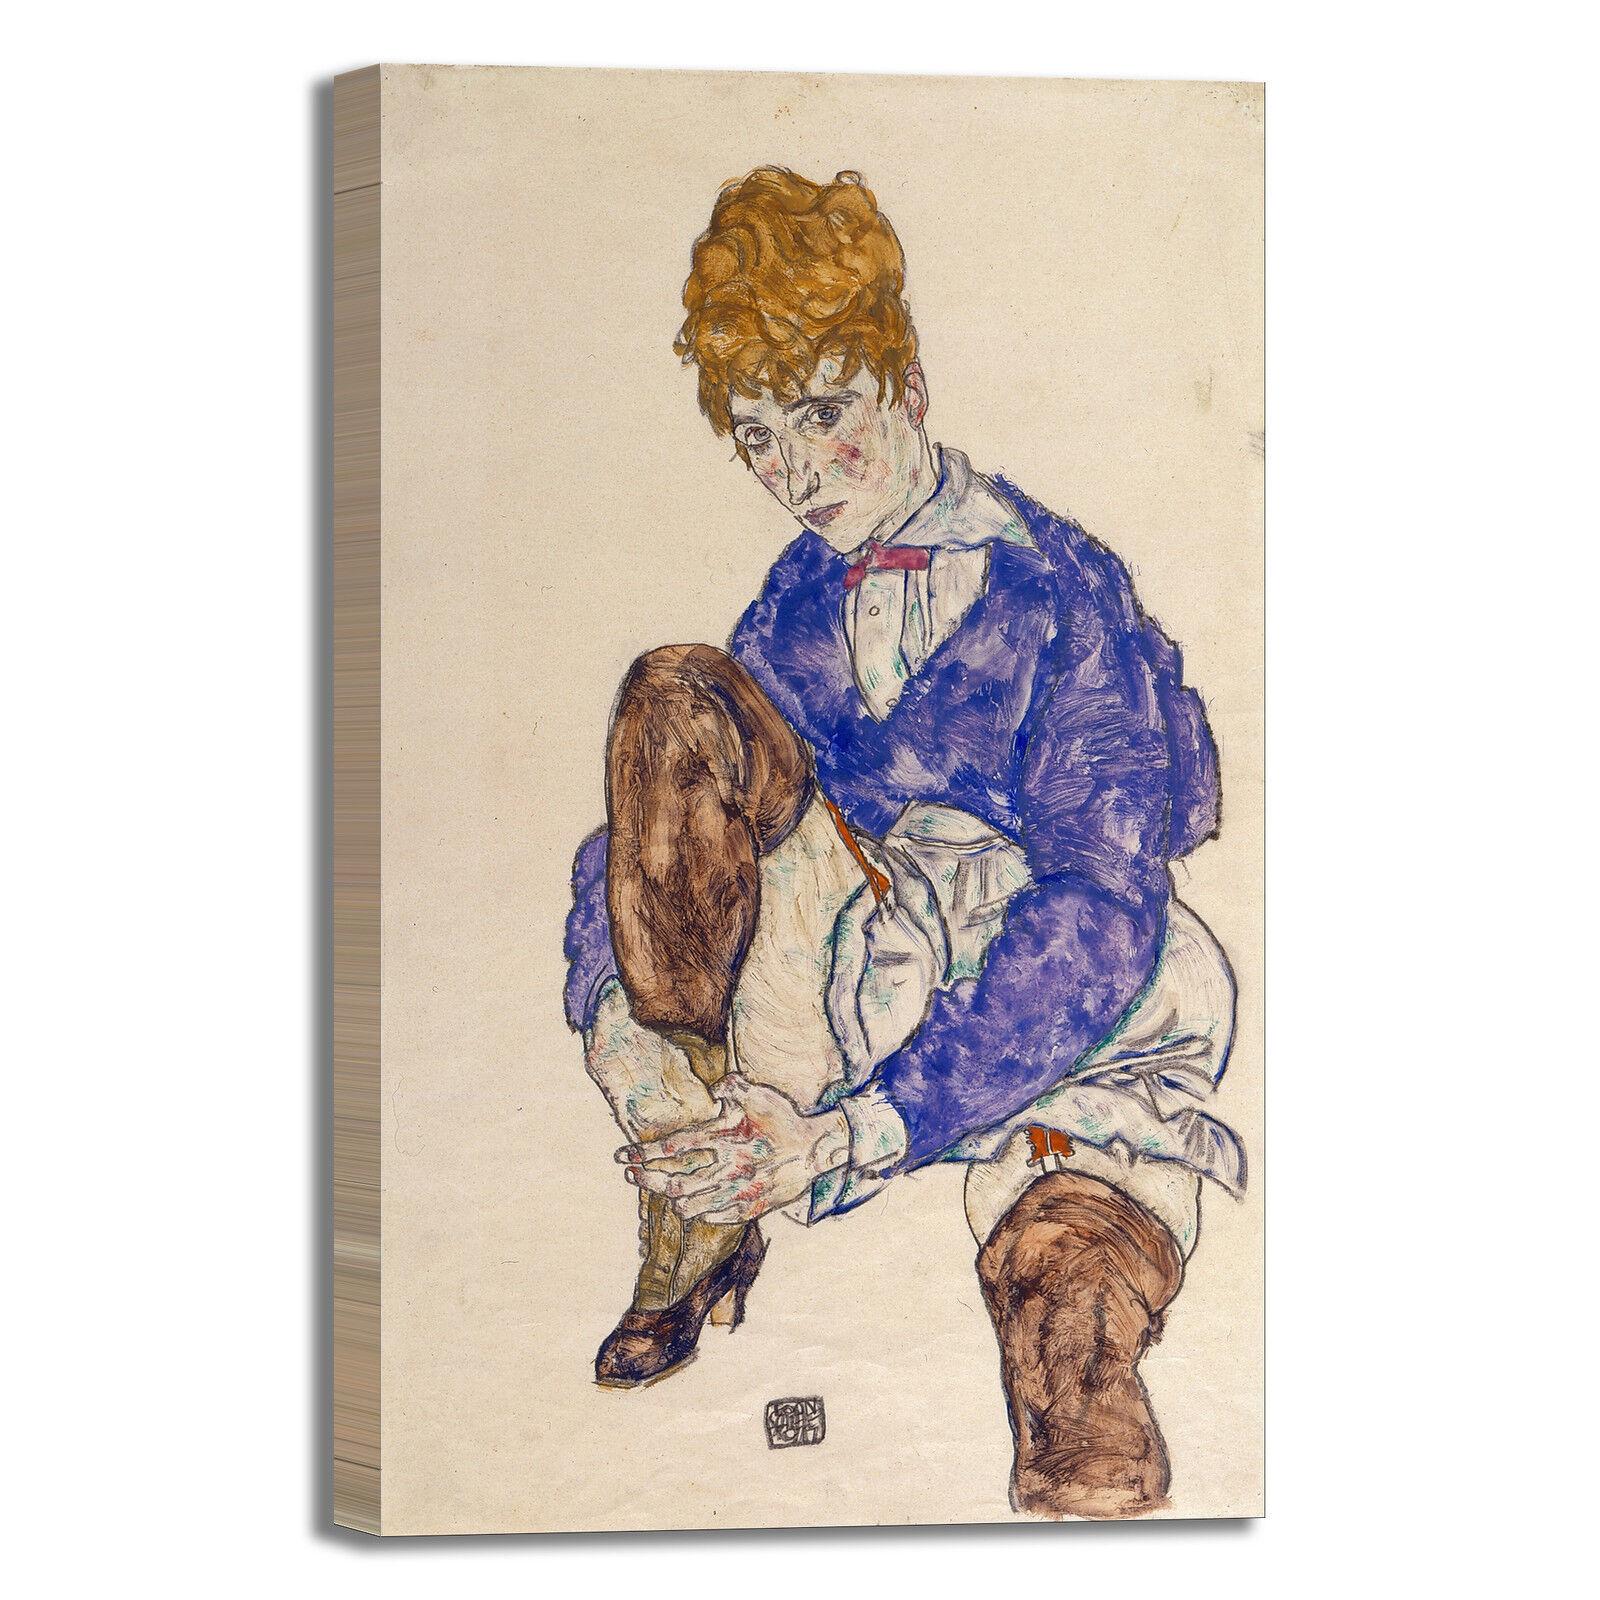 Schiele moglie seduta design design seduta quadro stampa tela dipinto telaio arRouge o casa 265018